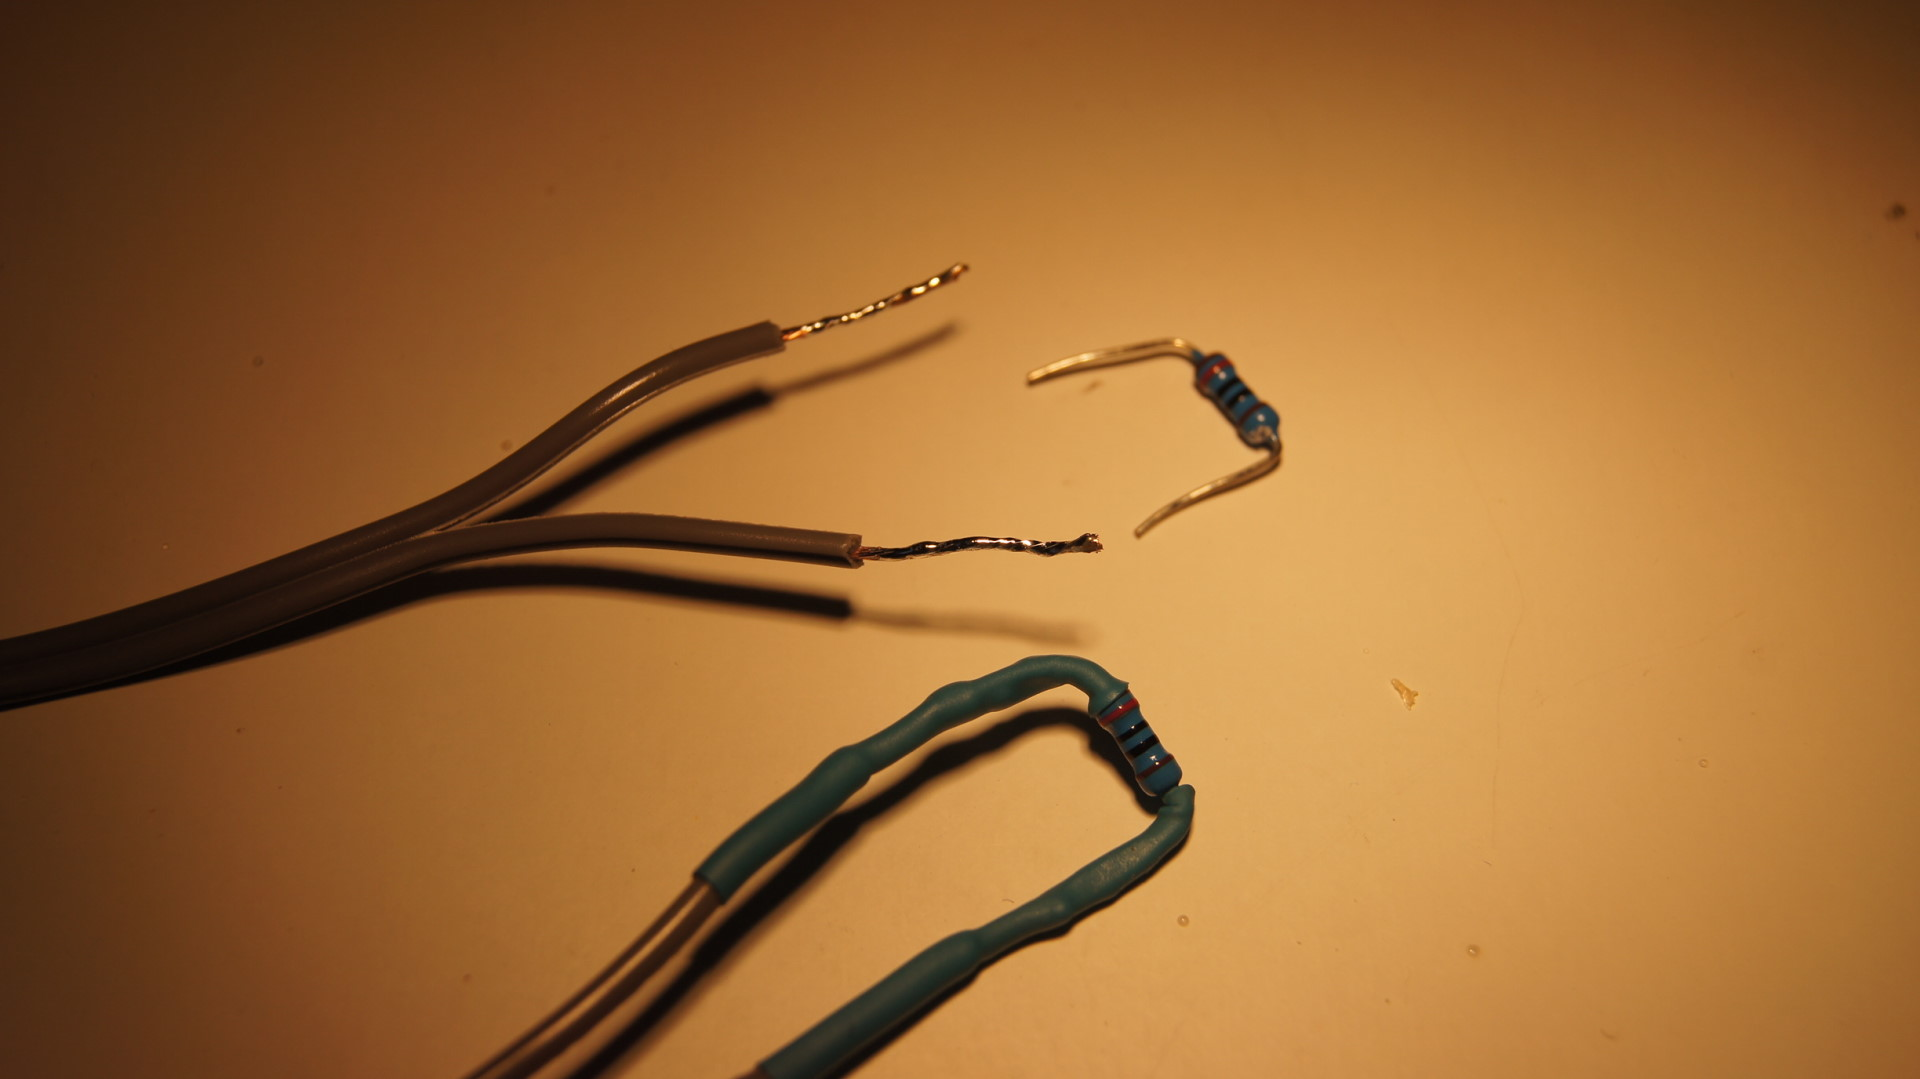 arduino controller area network can modelrail otenko terminators one node setup